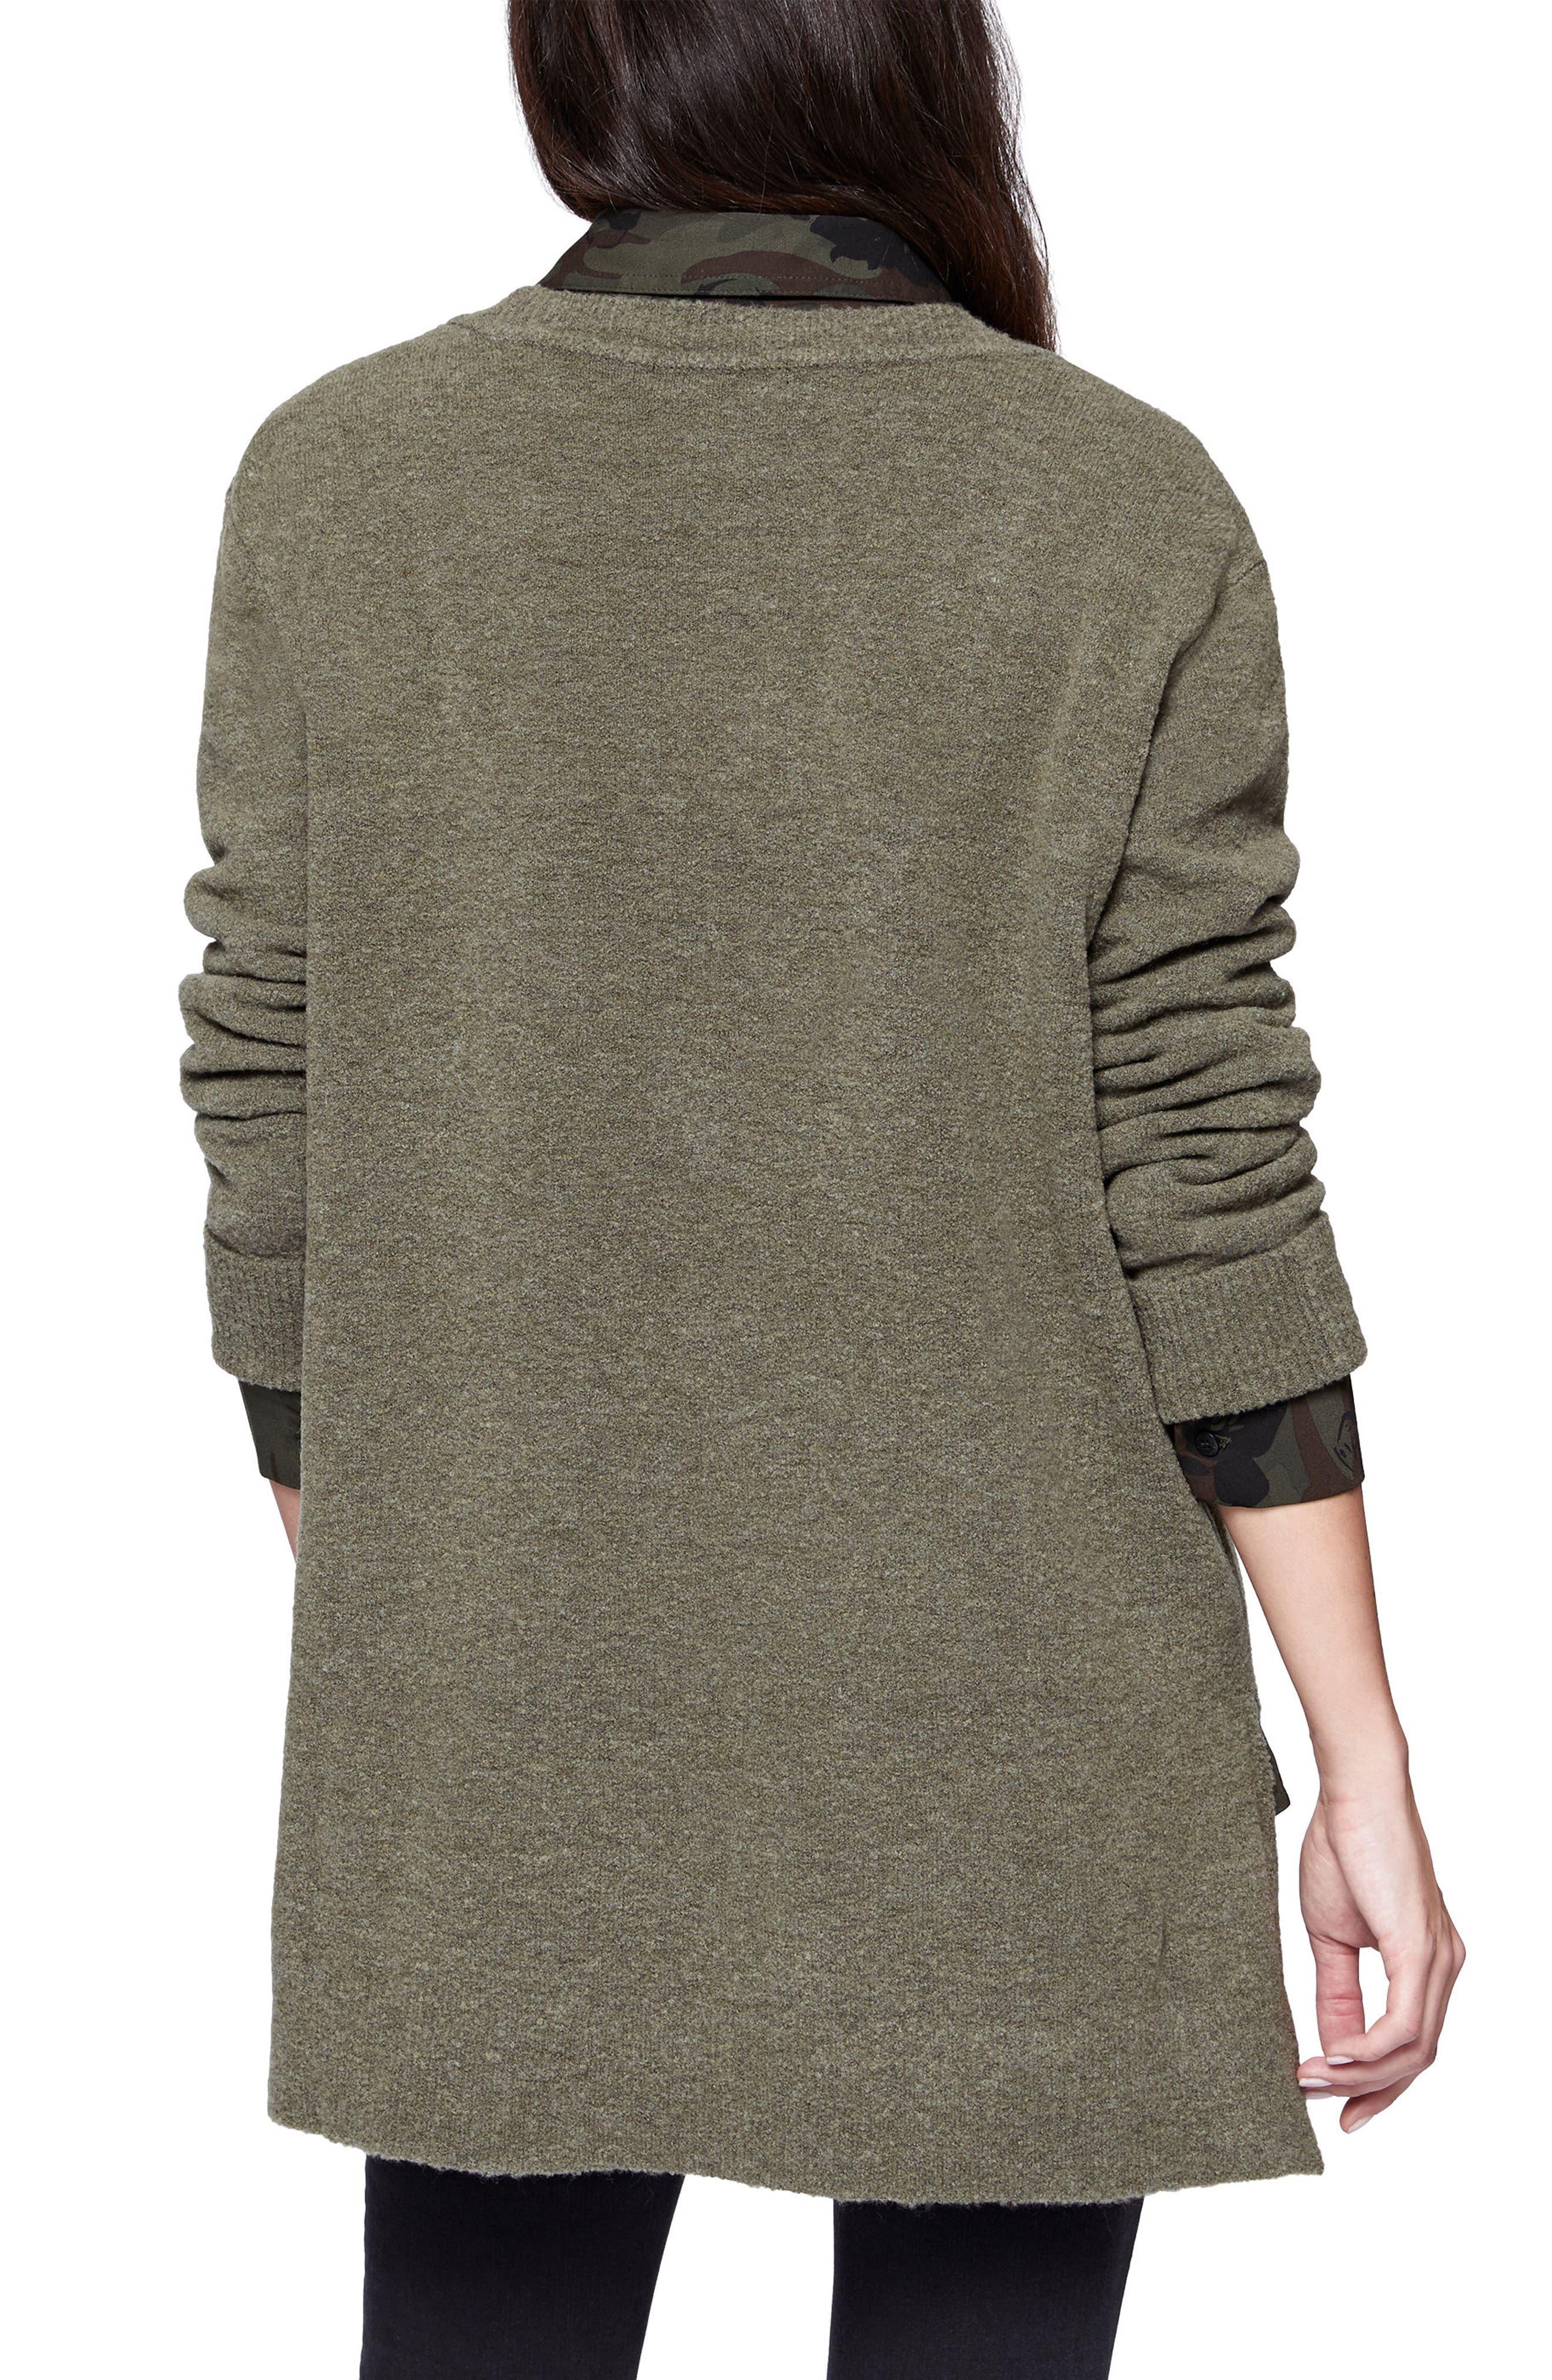 Santuary Delancey V-Neck Sweater,                             Alternate thumbnail 2, color,                             Fatigue